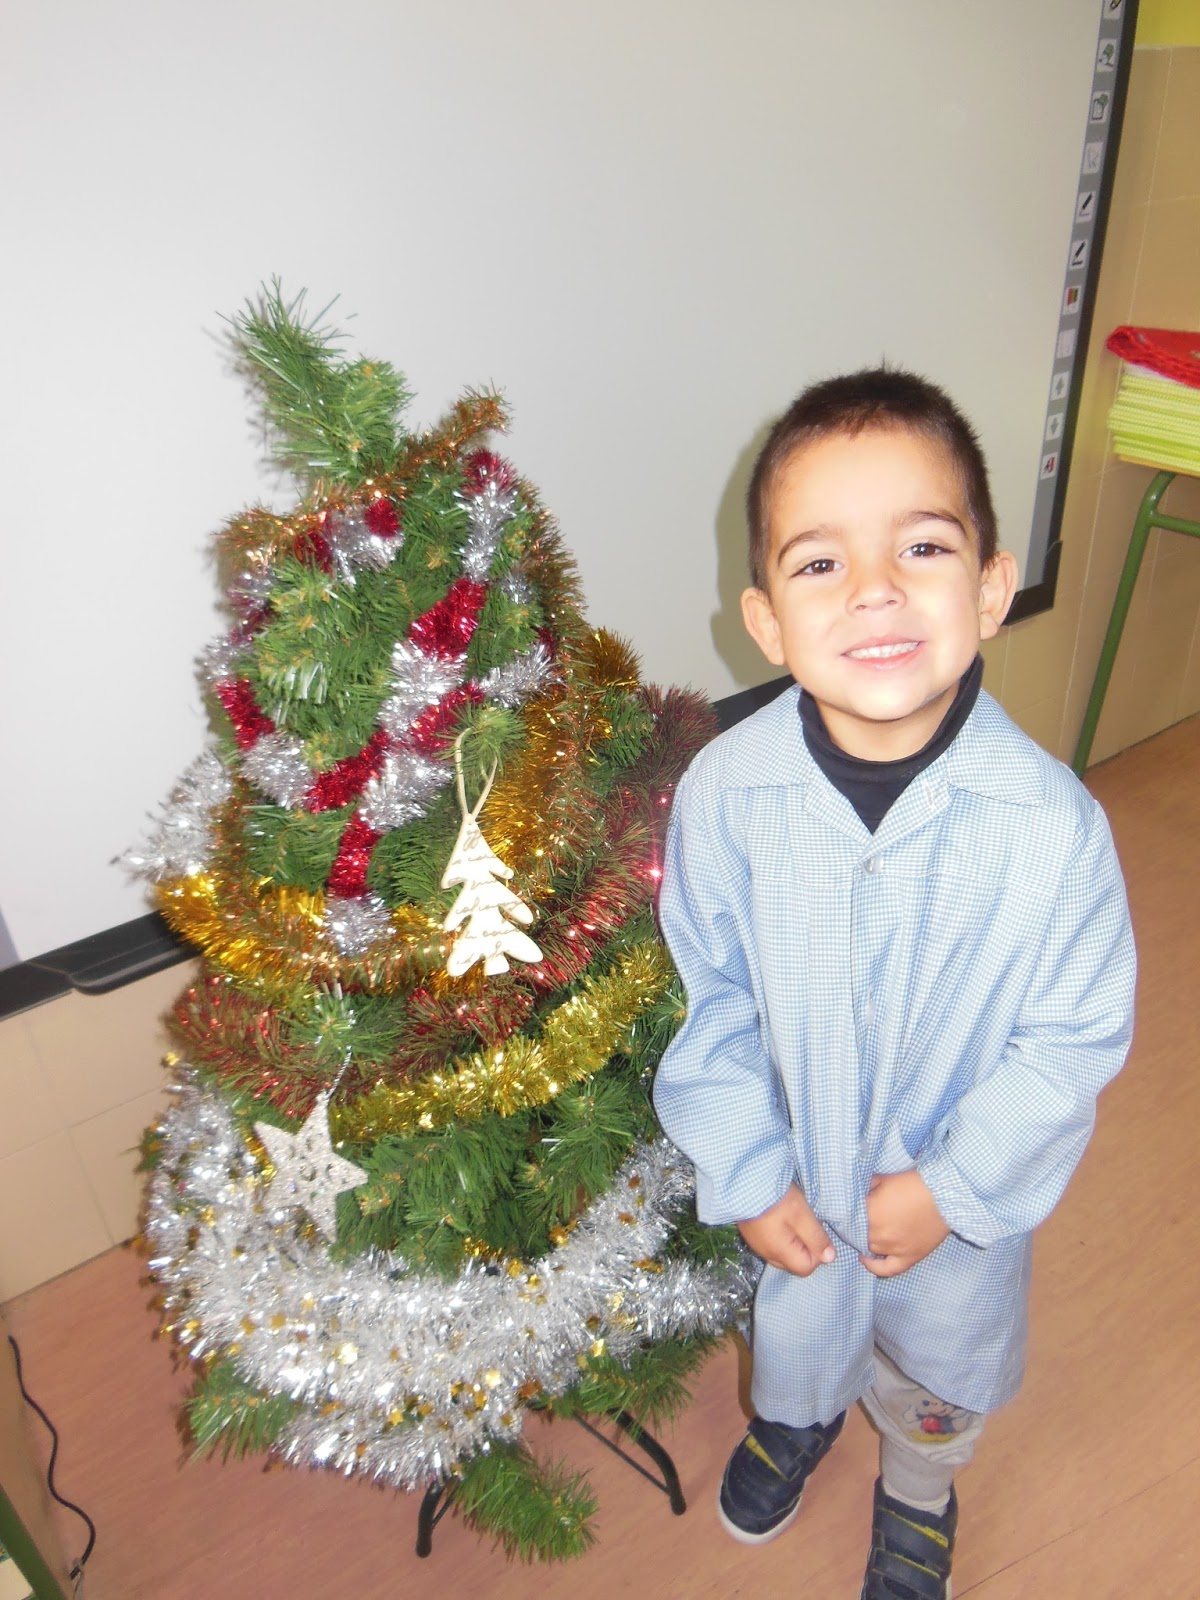 Decoramos Aula Arbol Navidad Pinterest